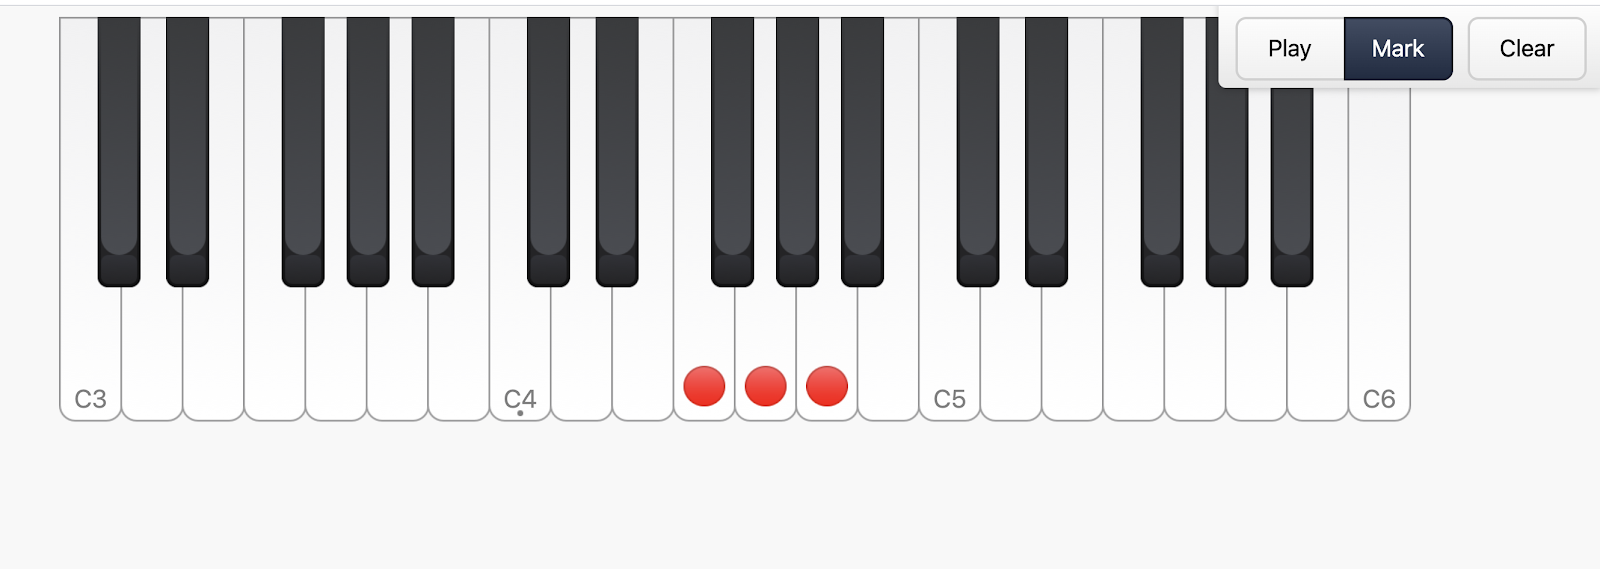 MusicTheory.net Piano